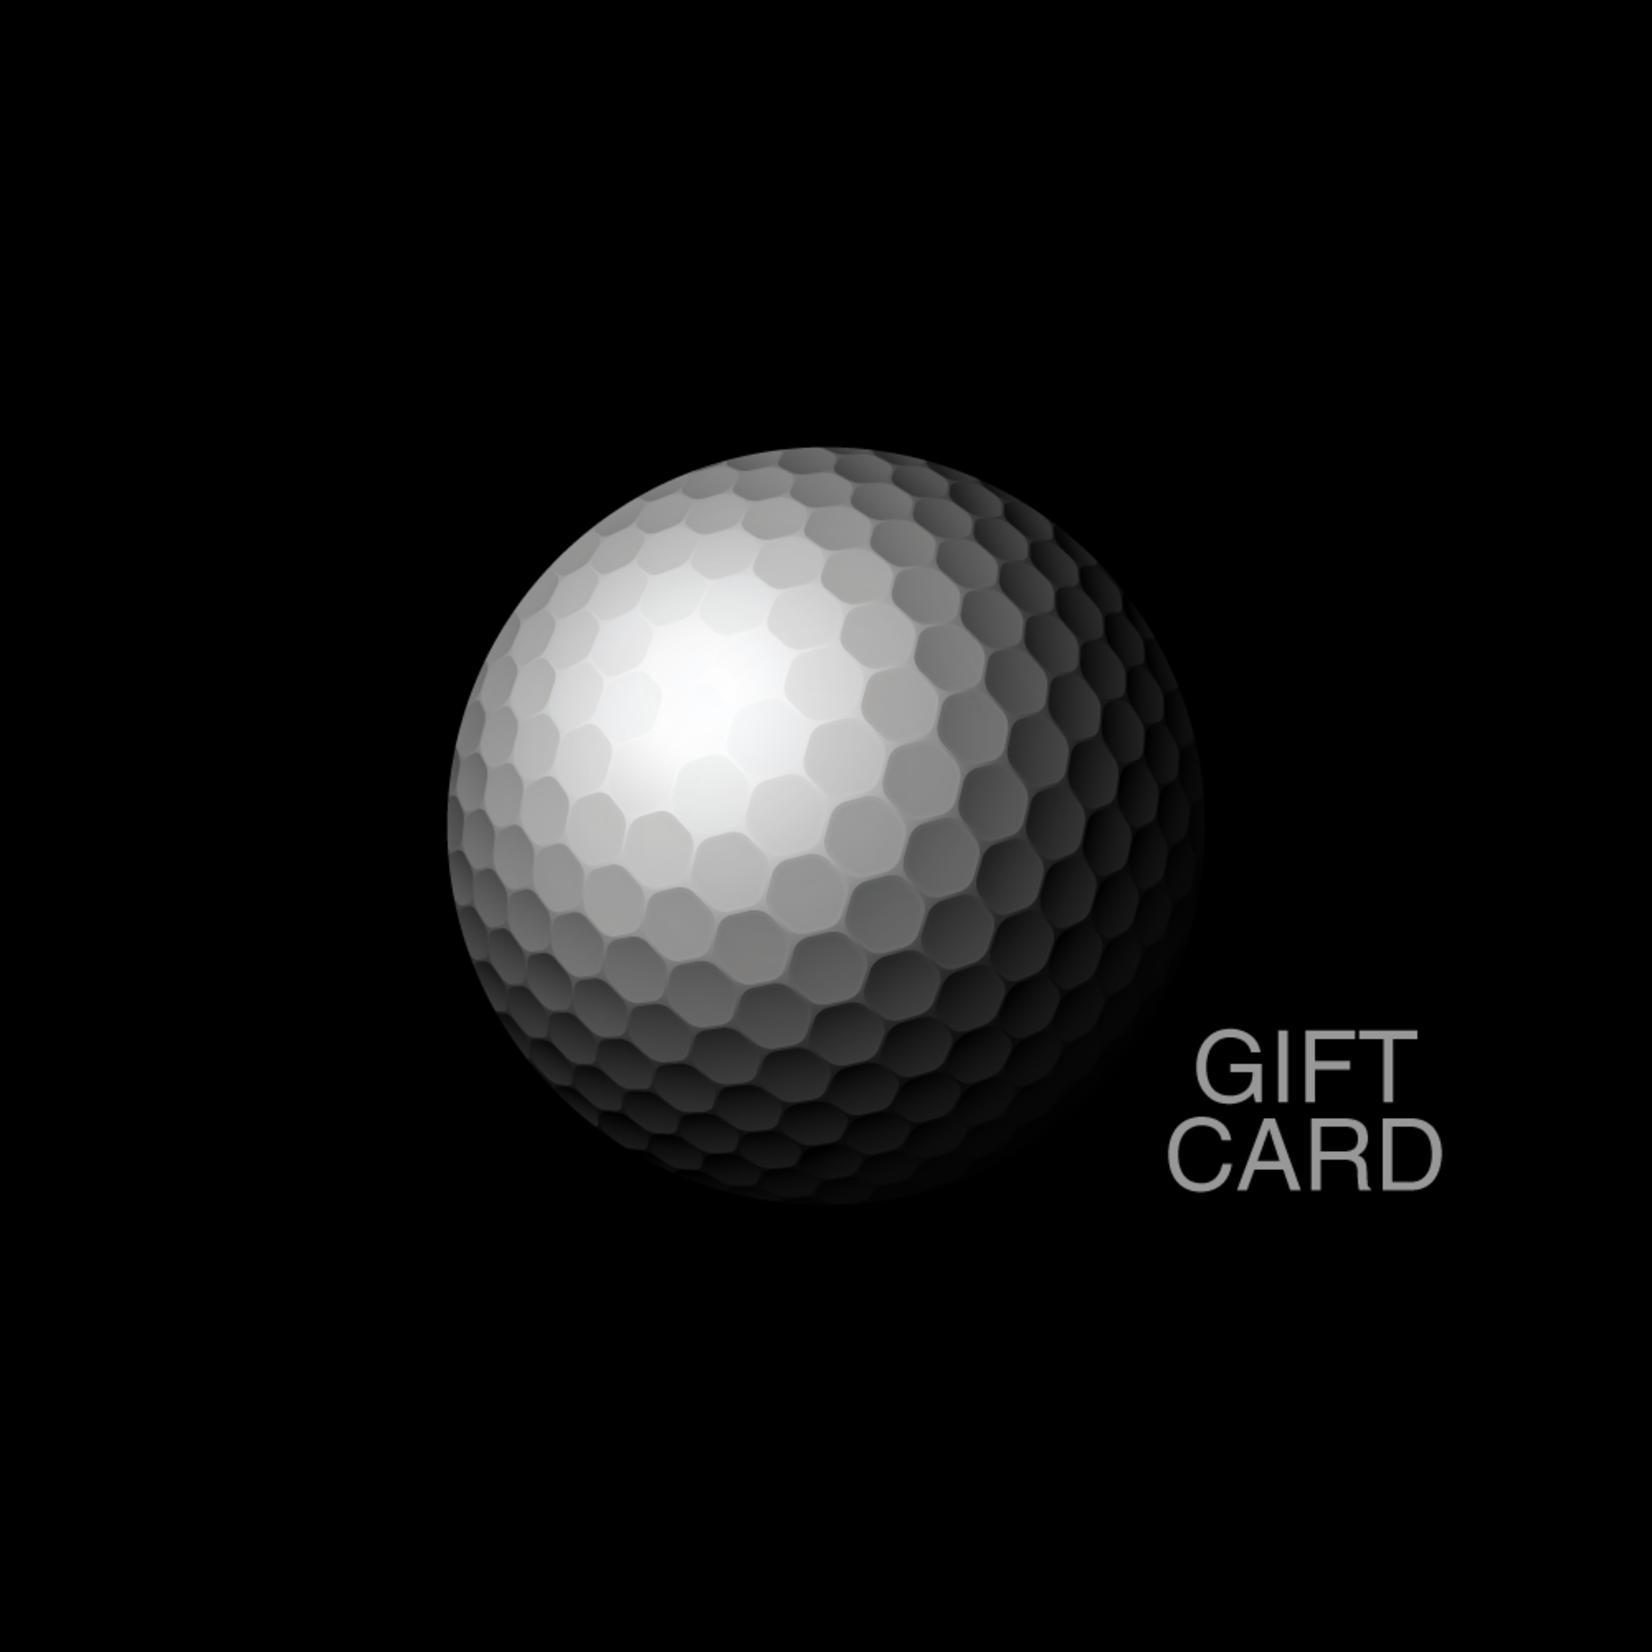 Gift Cards - Golf Ball